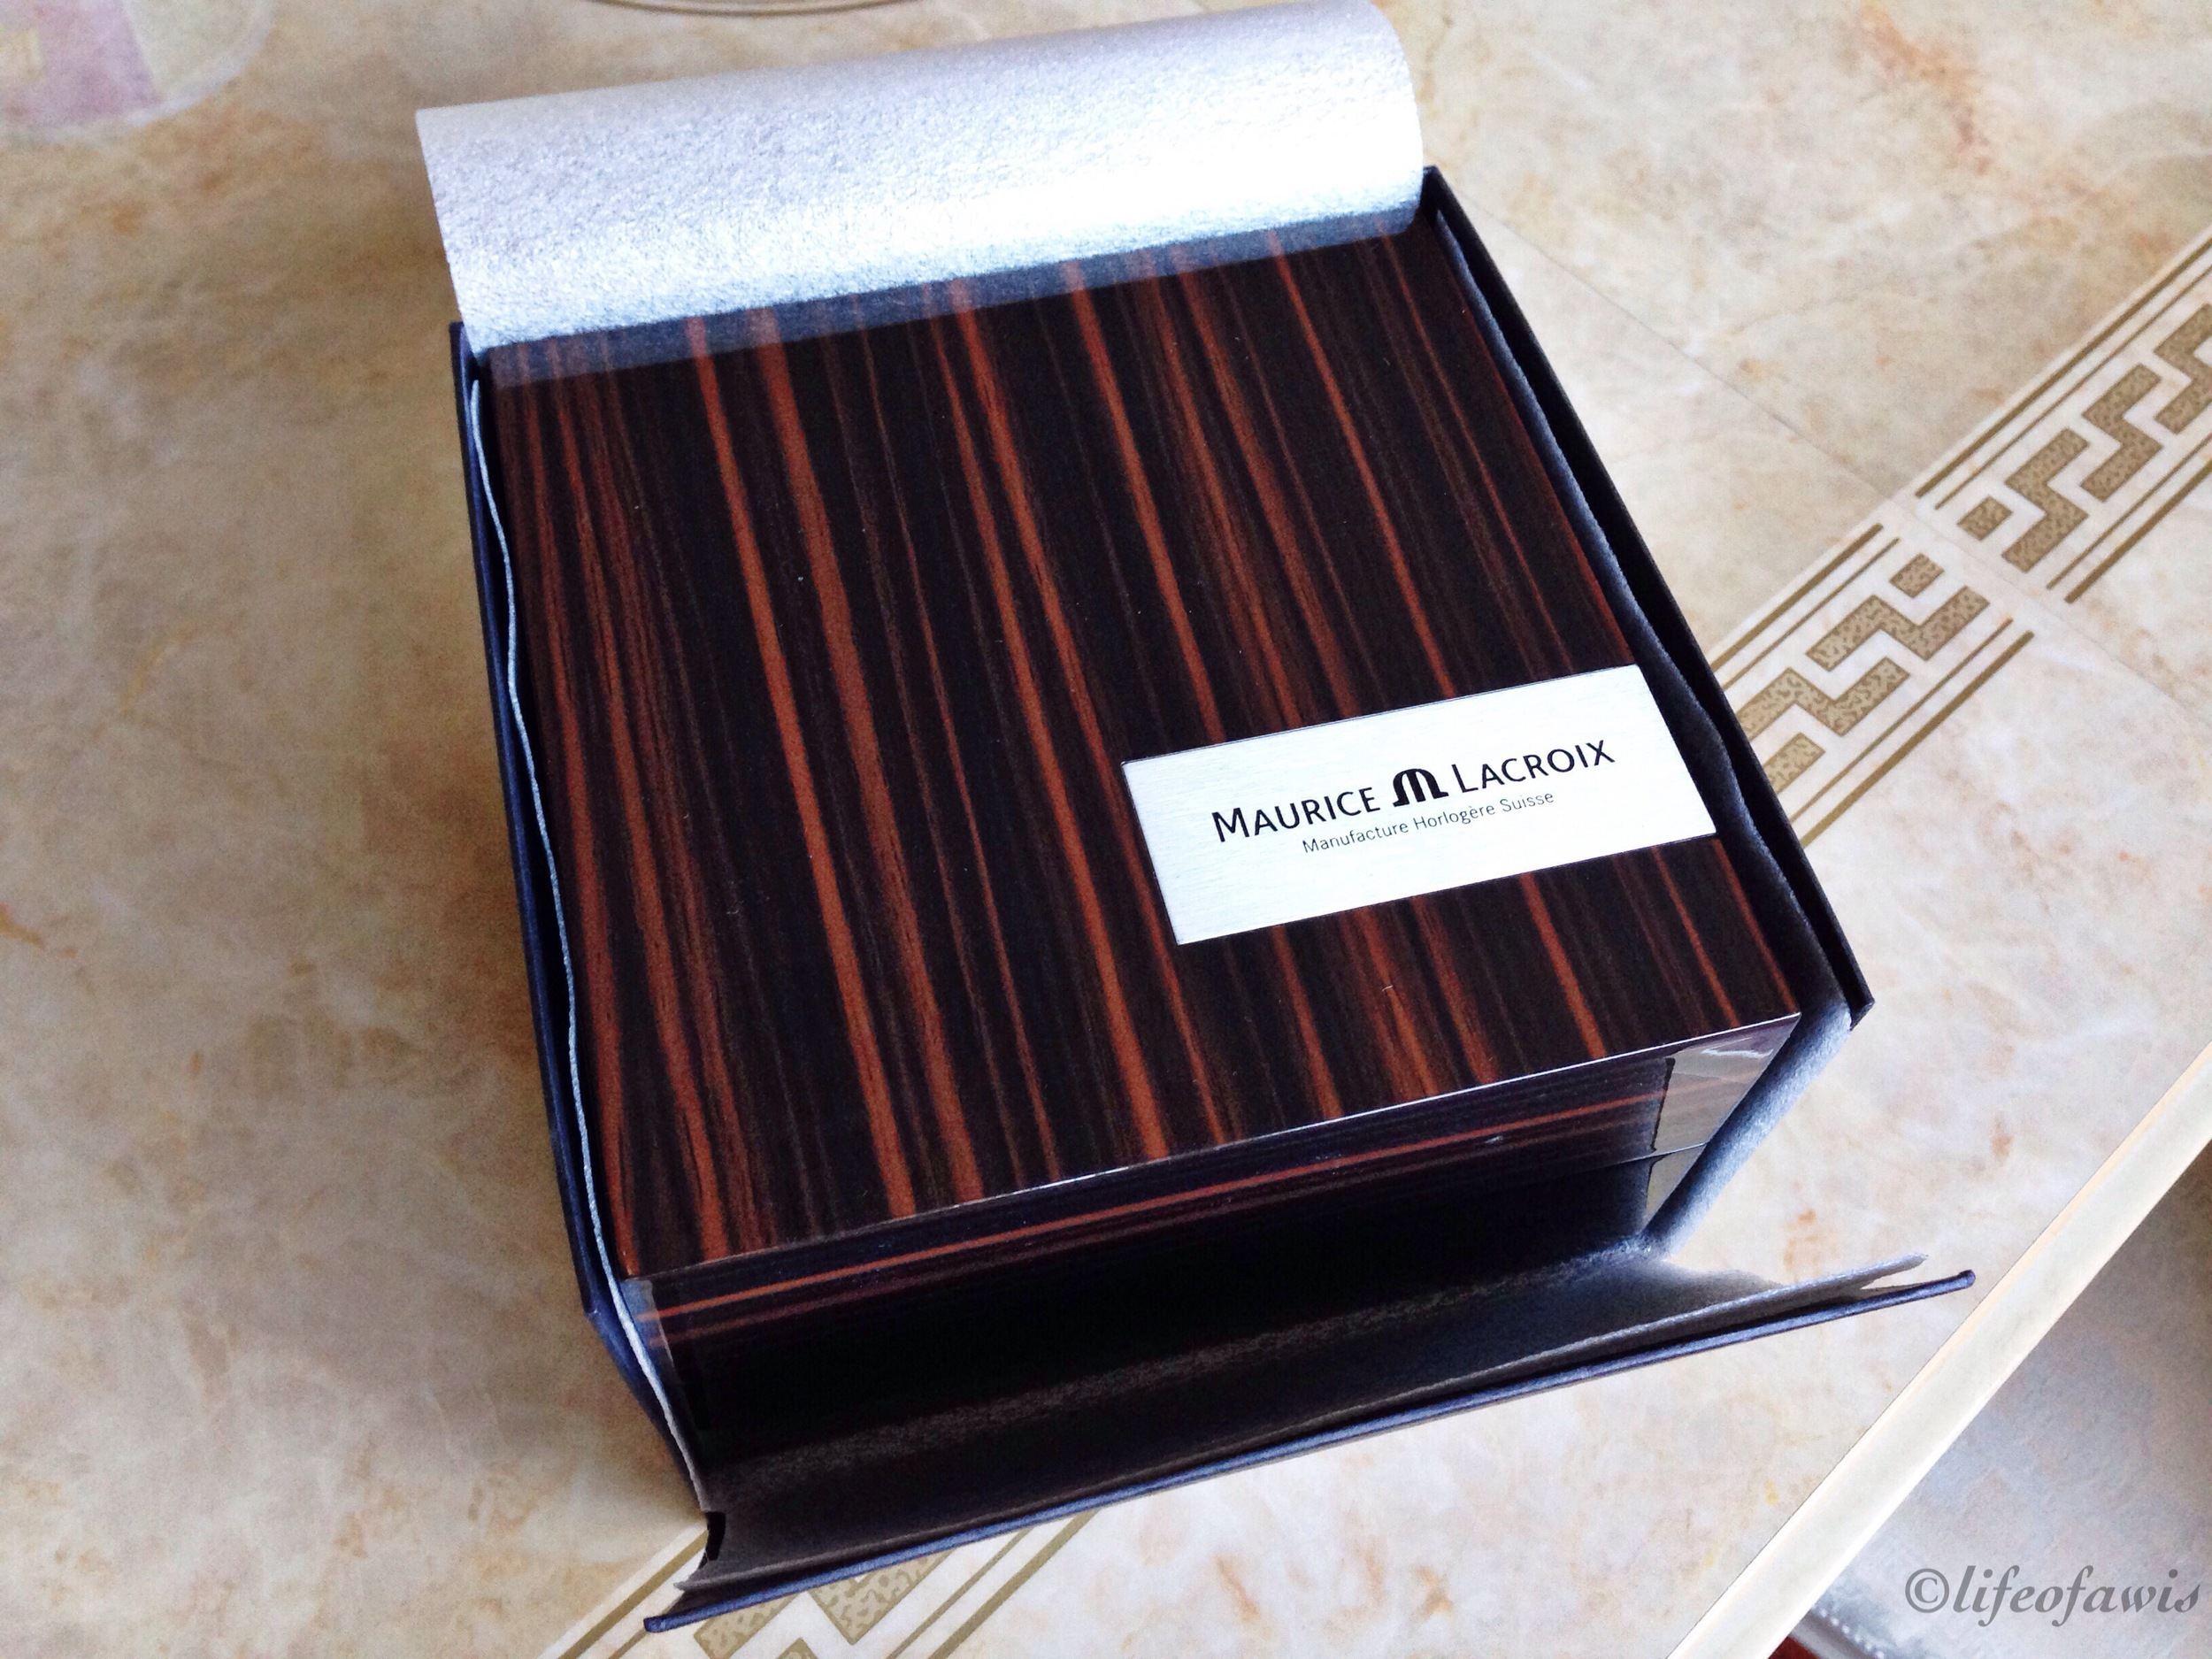 maurice-lacroix-wood-box